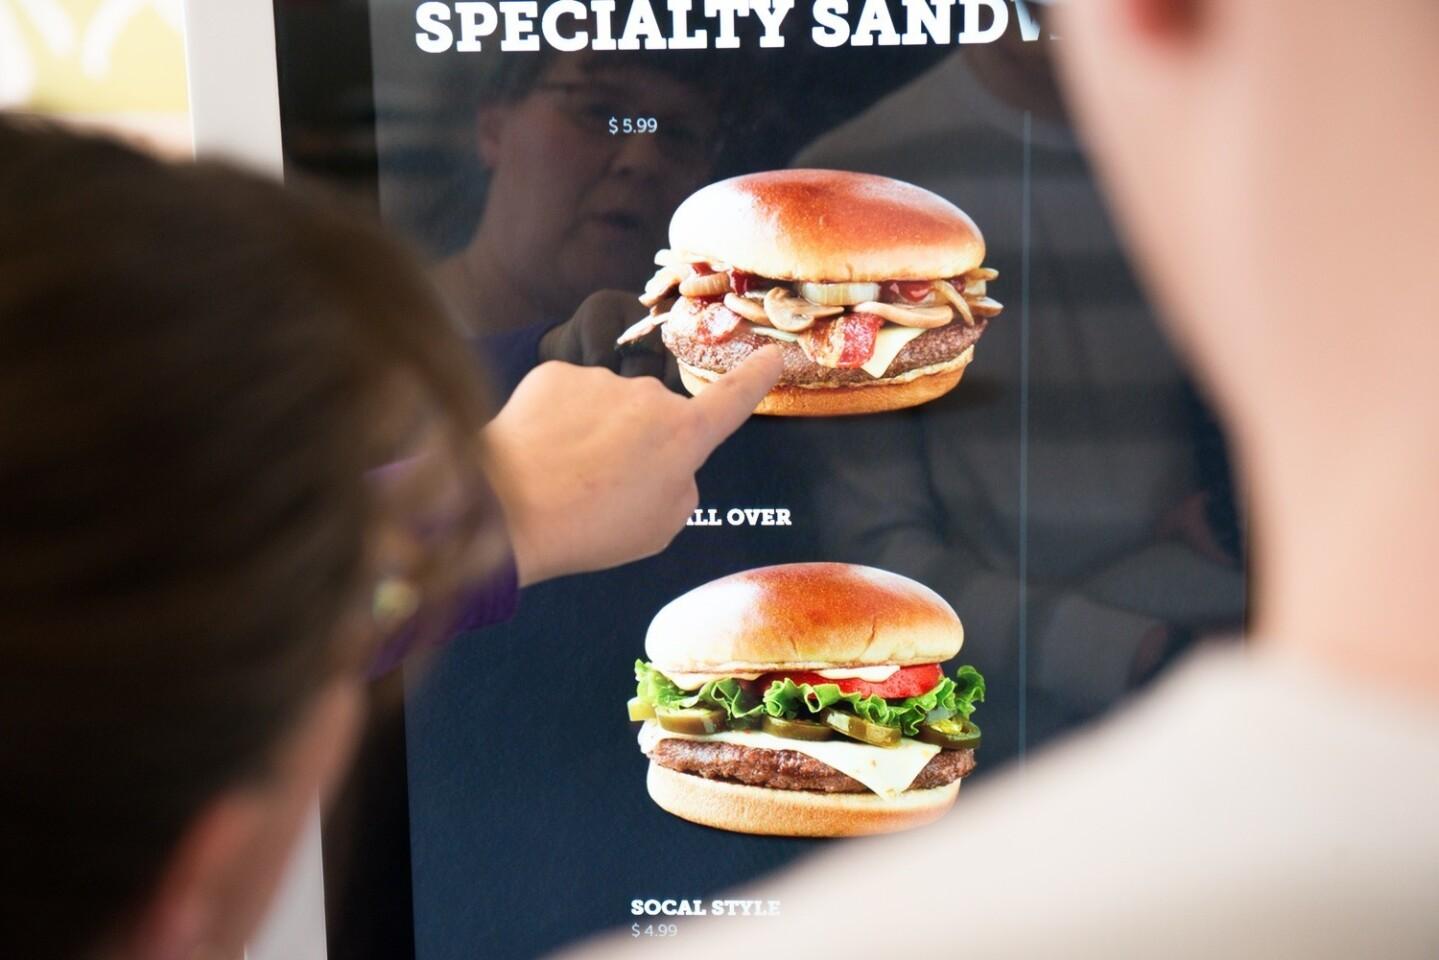 A customer uses McDonald's new Create Your Taste kiosk to order a burger.